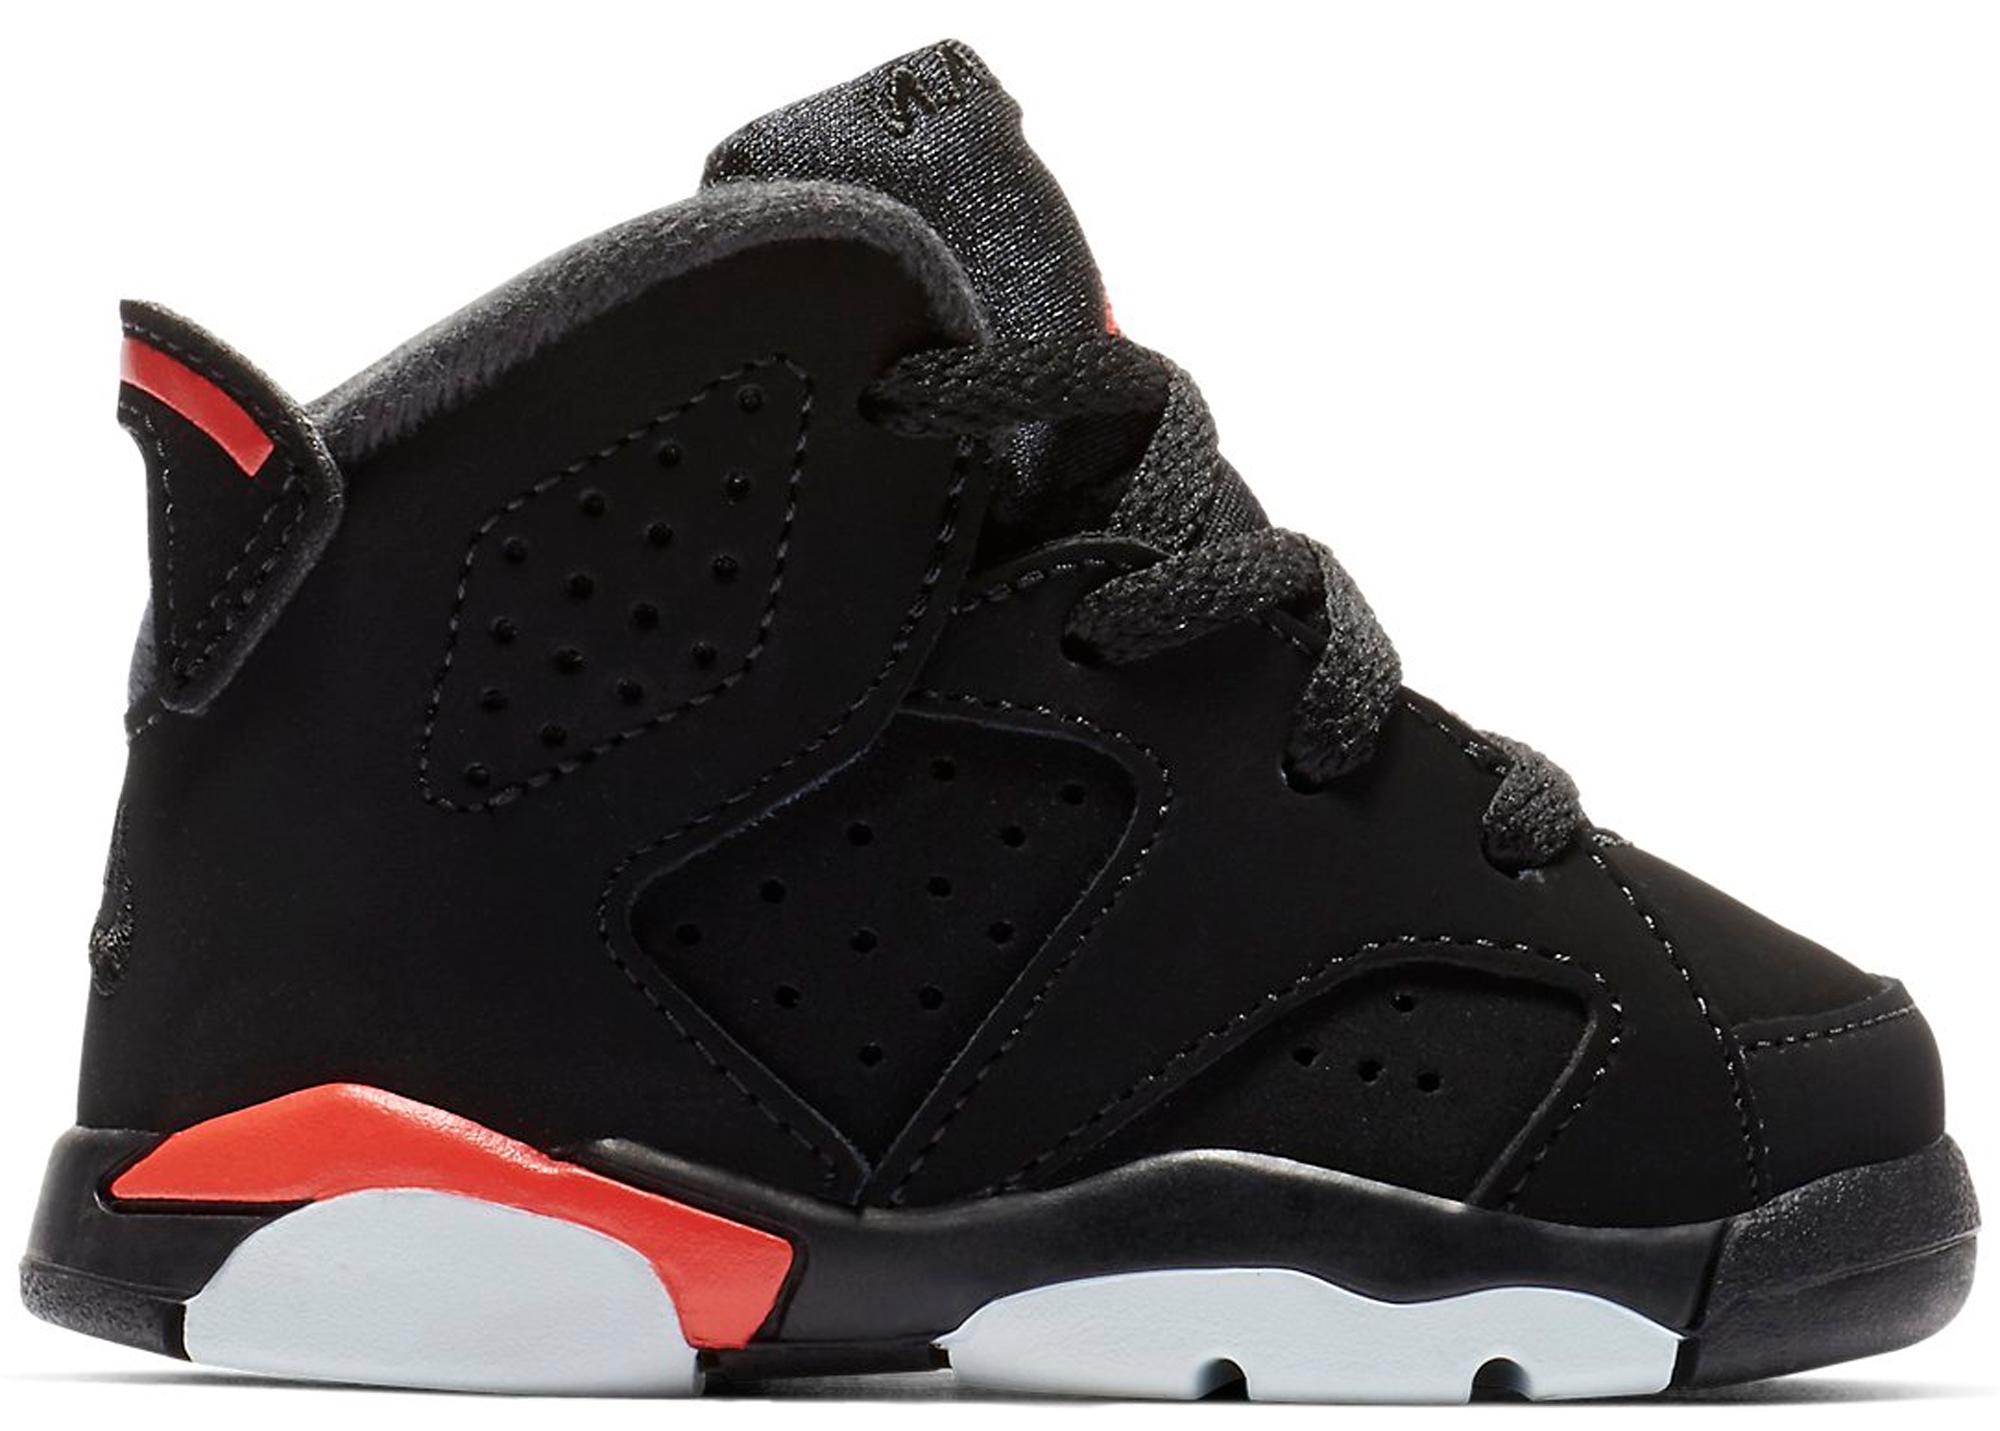 Jordan 6 Retro Black Infrared 2019 (TD)